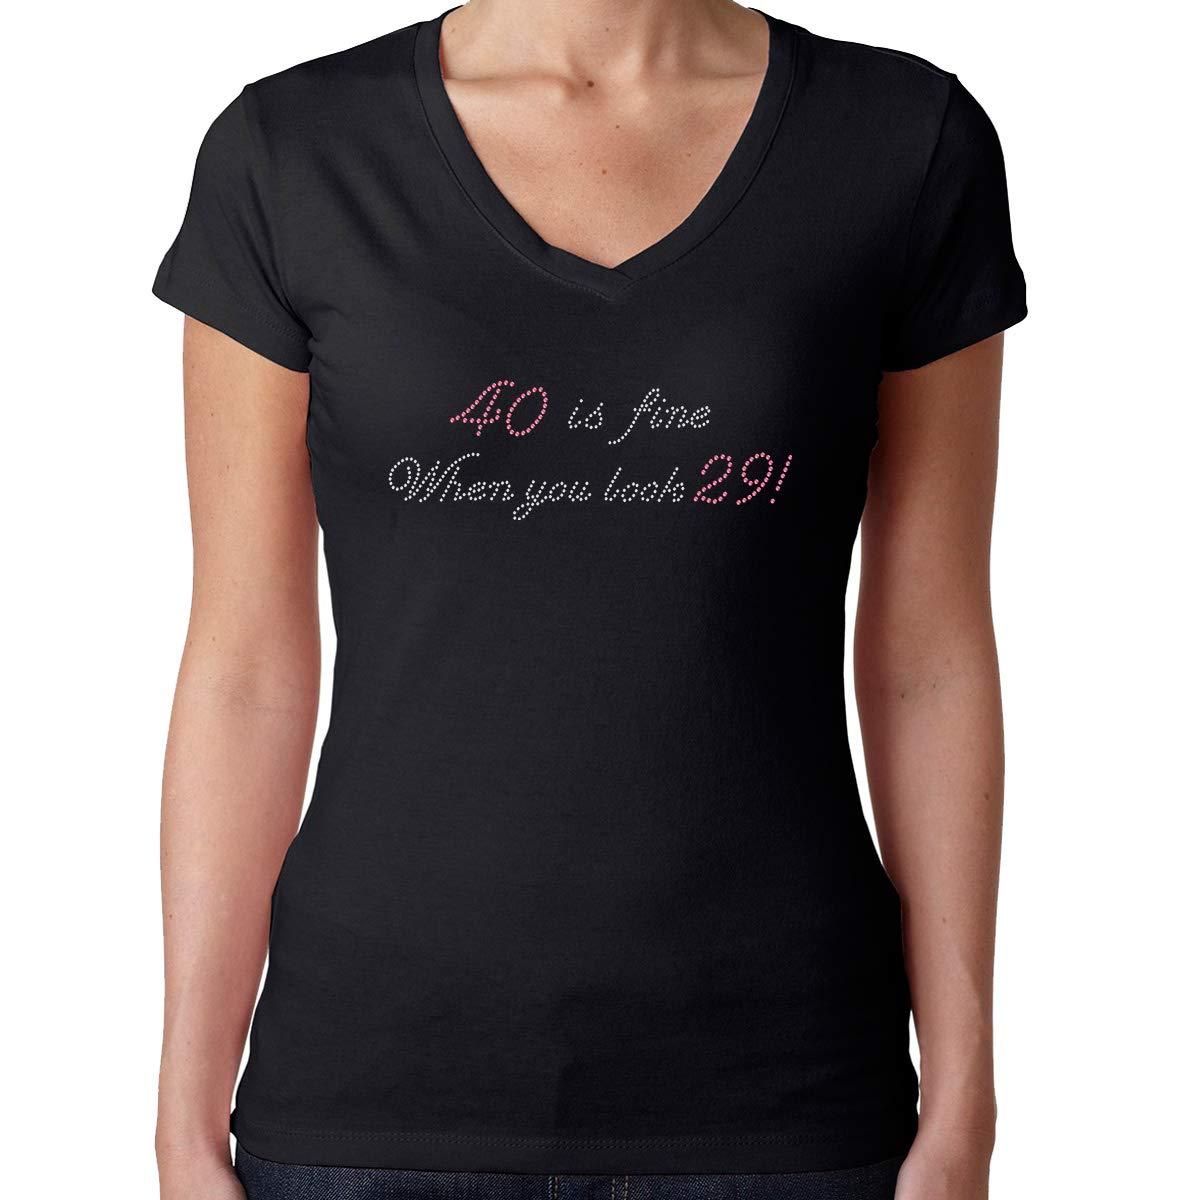 Rhinestone Wear Womens T-Shirt Bling Black Tee 40 is Fine When You Look 29 V-Neck Medium